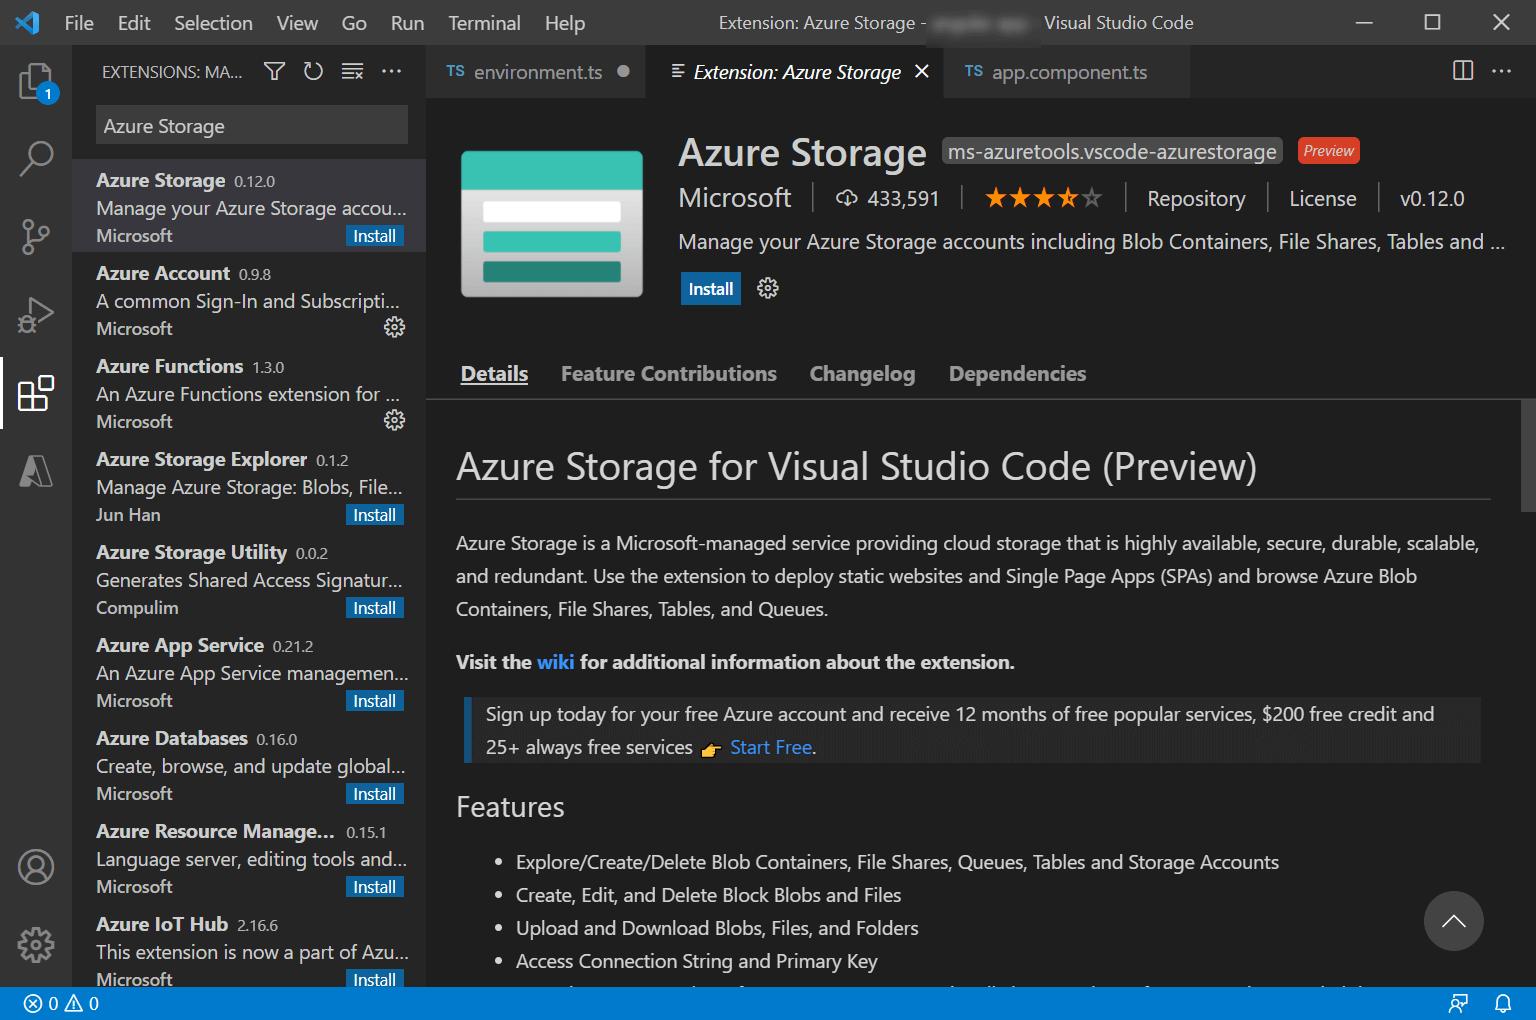 azure-storage.png